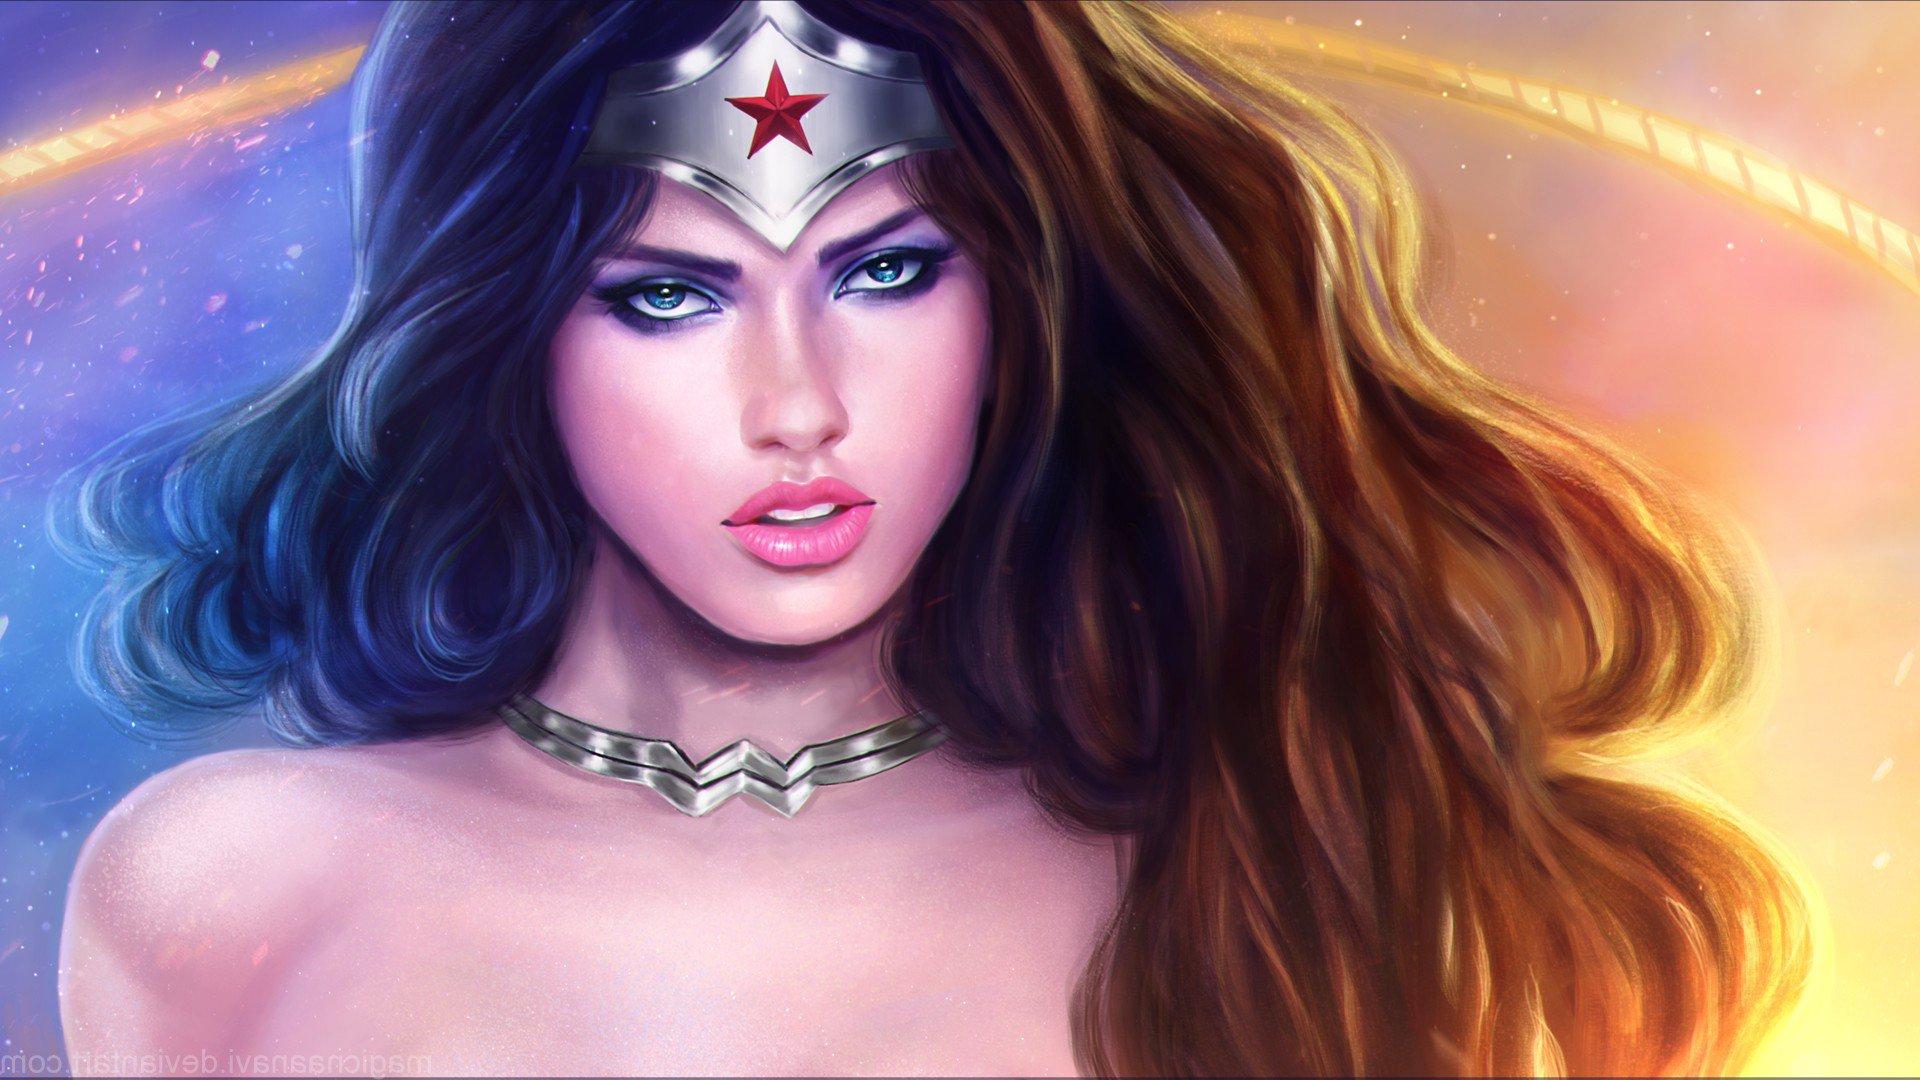 Free Download Girl Wallpaper For 360x640 Wonder Woman Hd Hd Fantasy Girls 4k Wallpapers Images